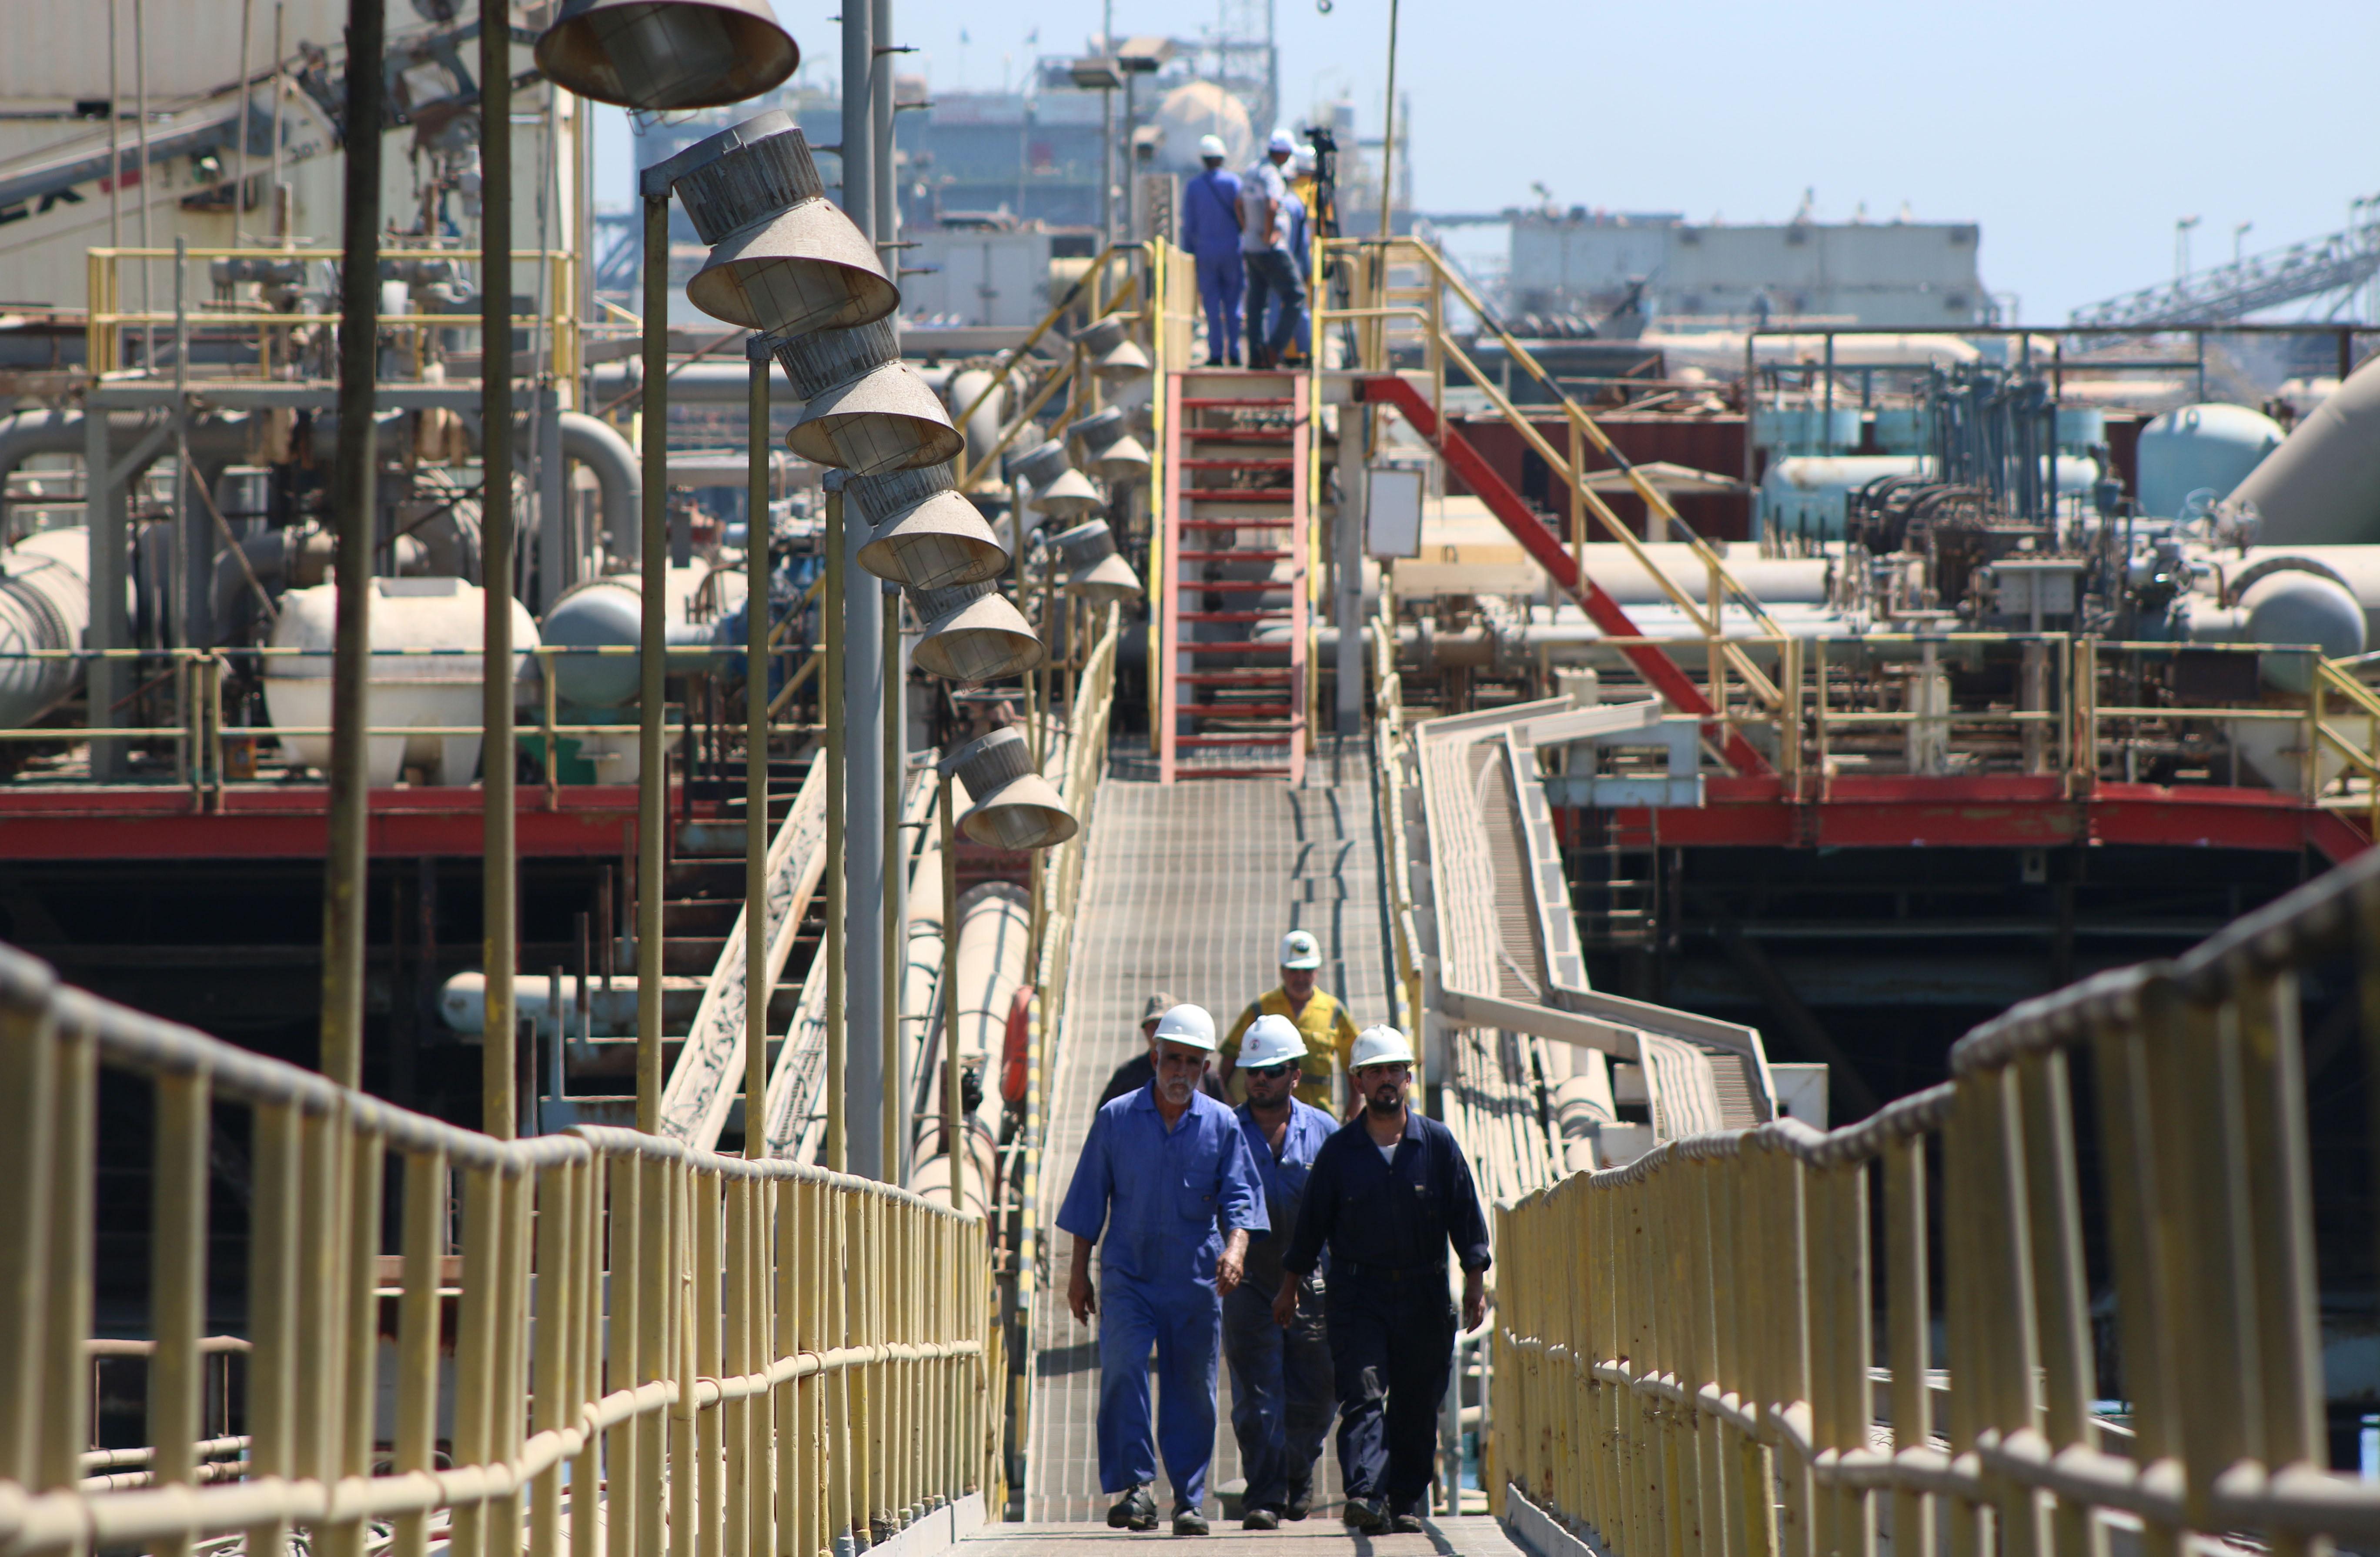 IRAQ-ECONOMY-OIL